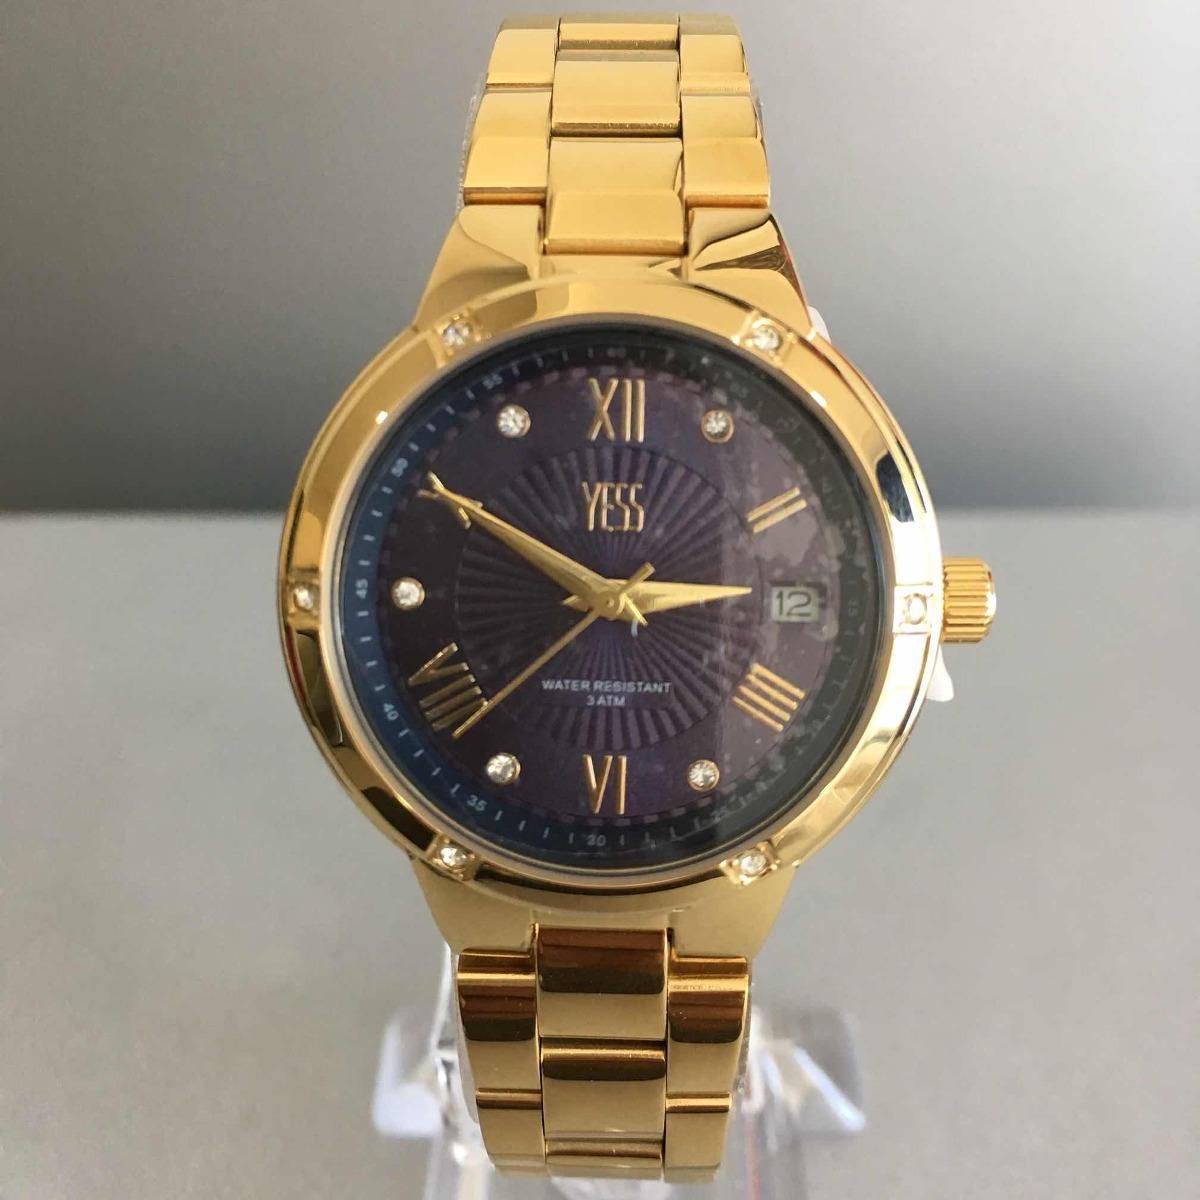 Reloj Yess Dama Dorado Original -   224.000 en Mercado Libre 0e1296514835